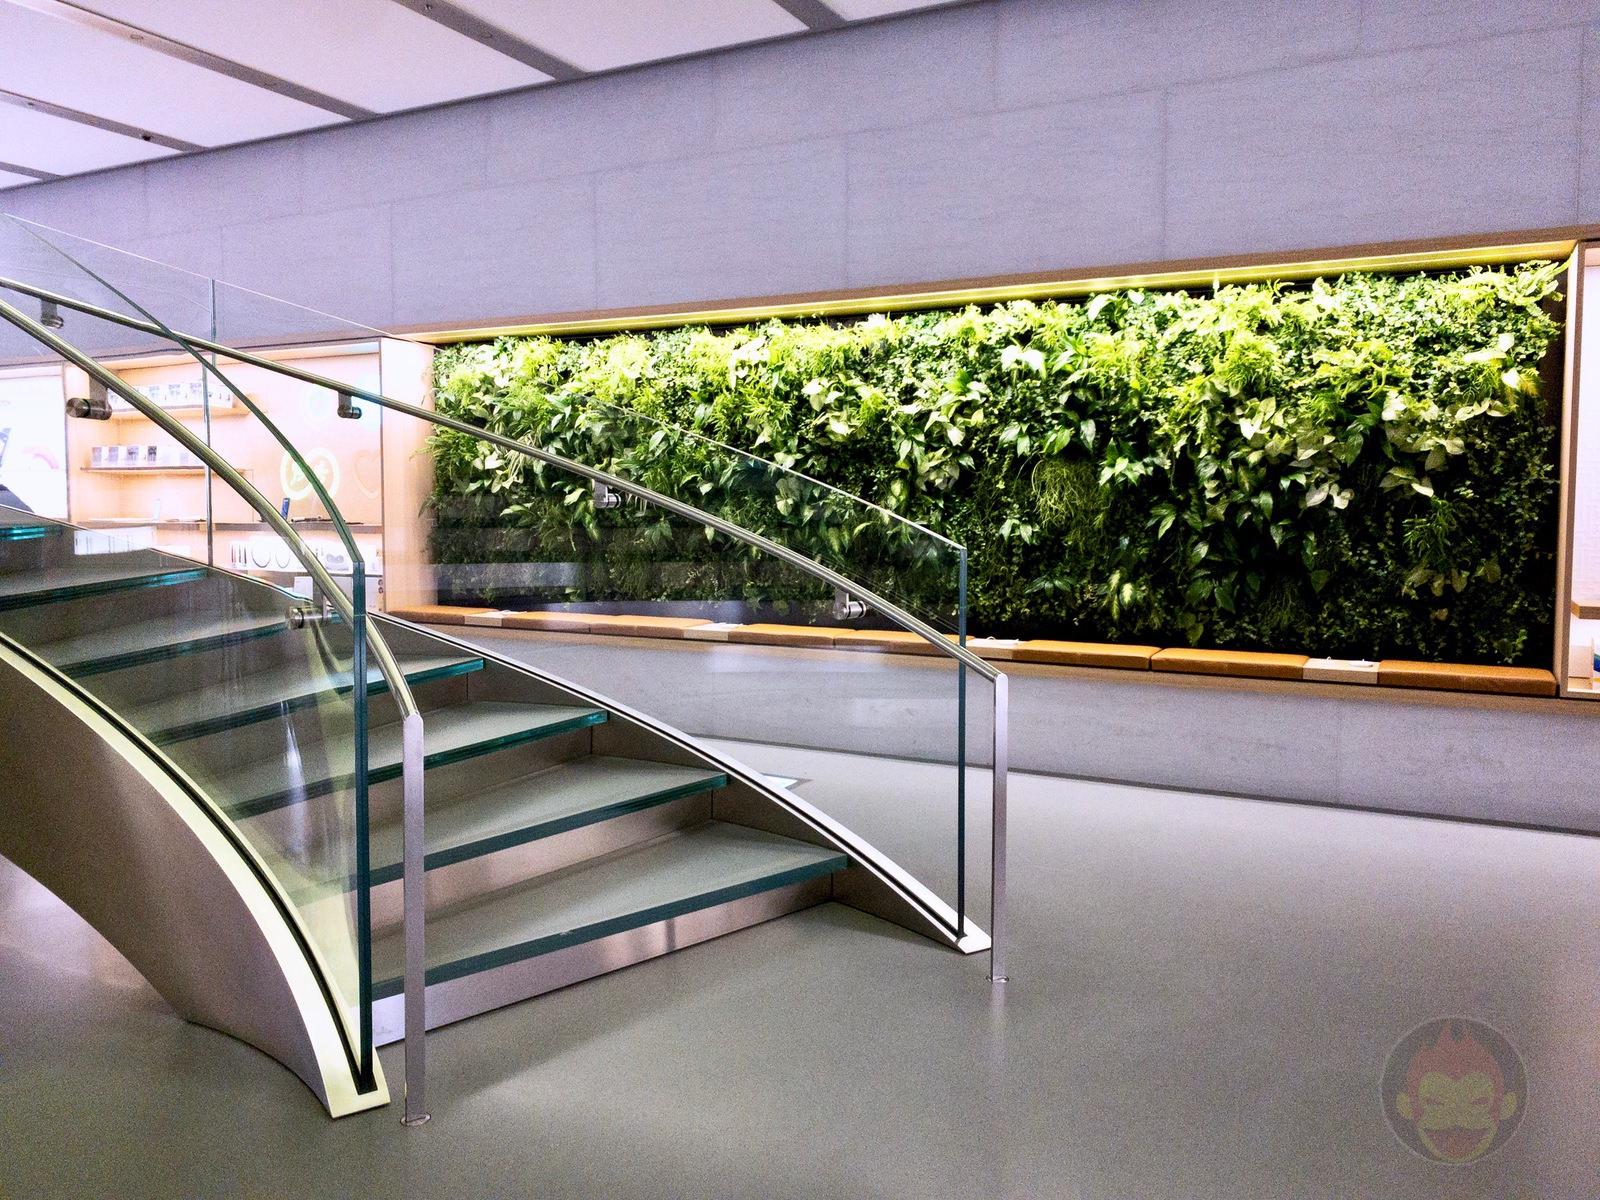 Apple Store Omotesando Basement floor renewal 49